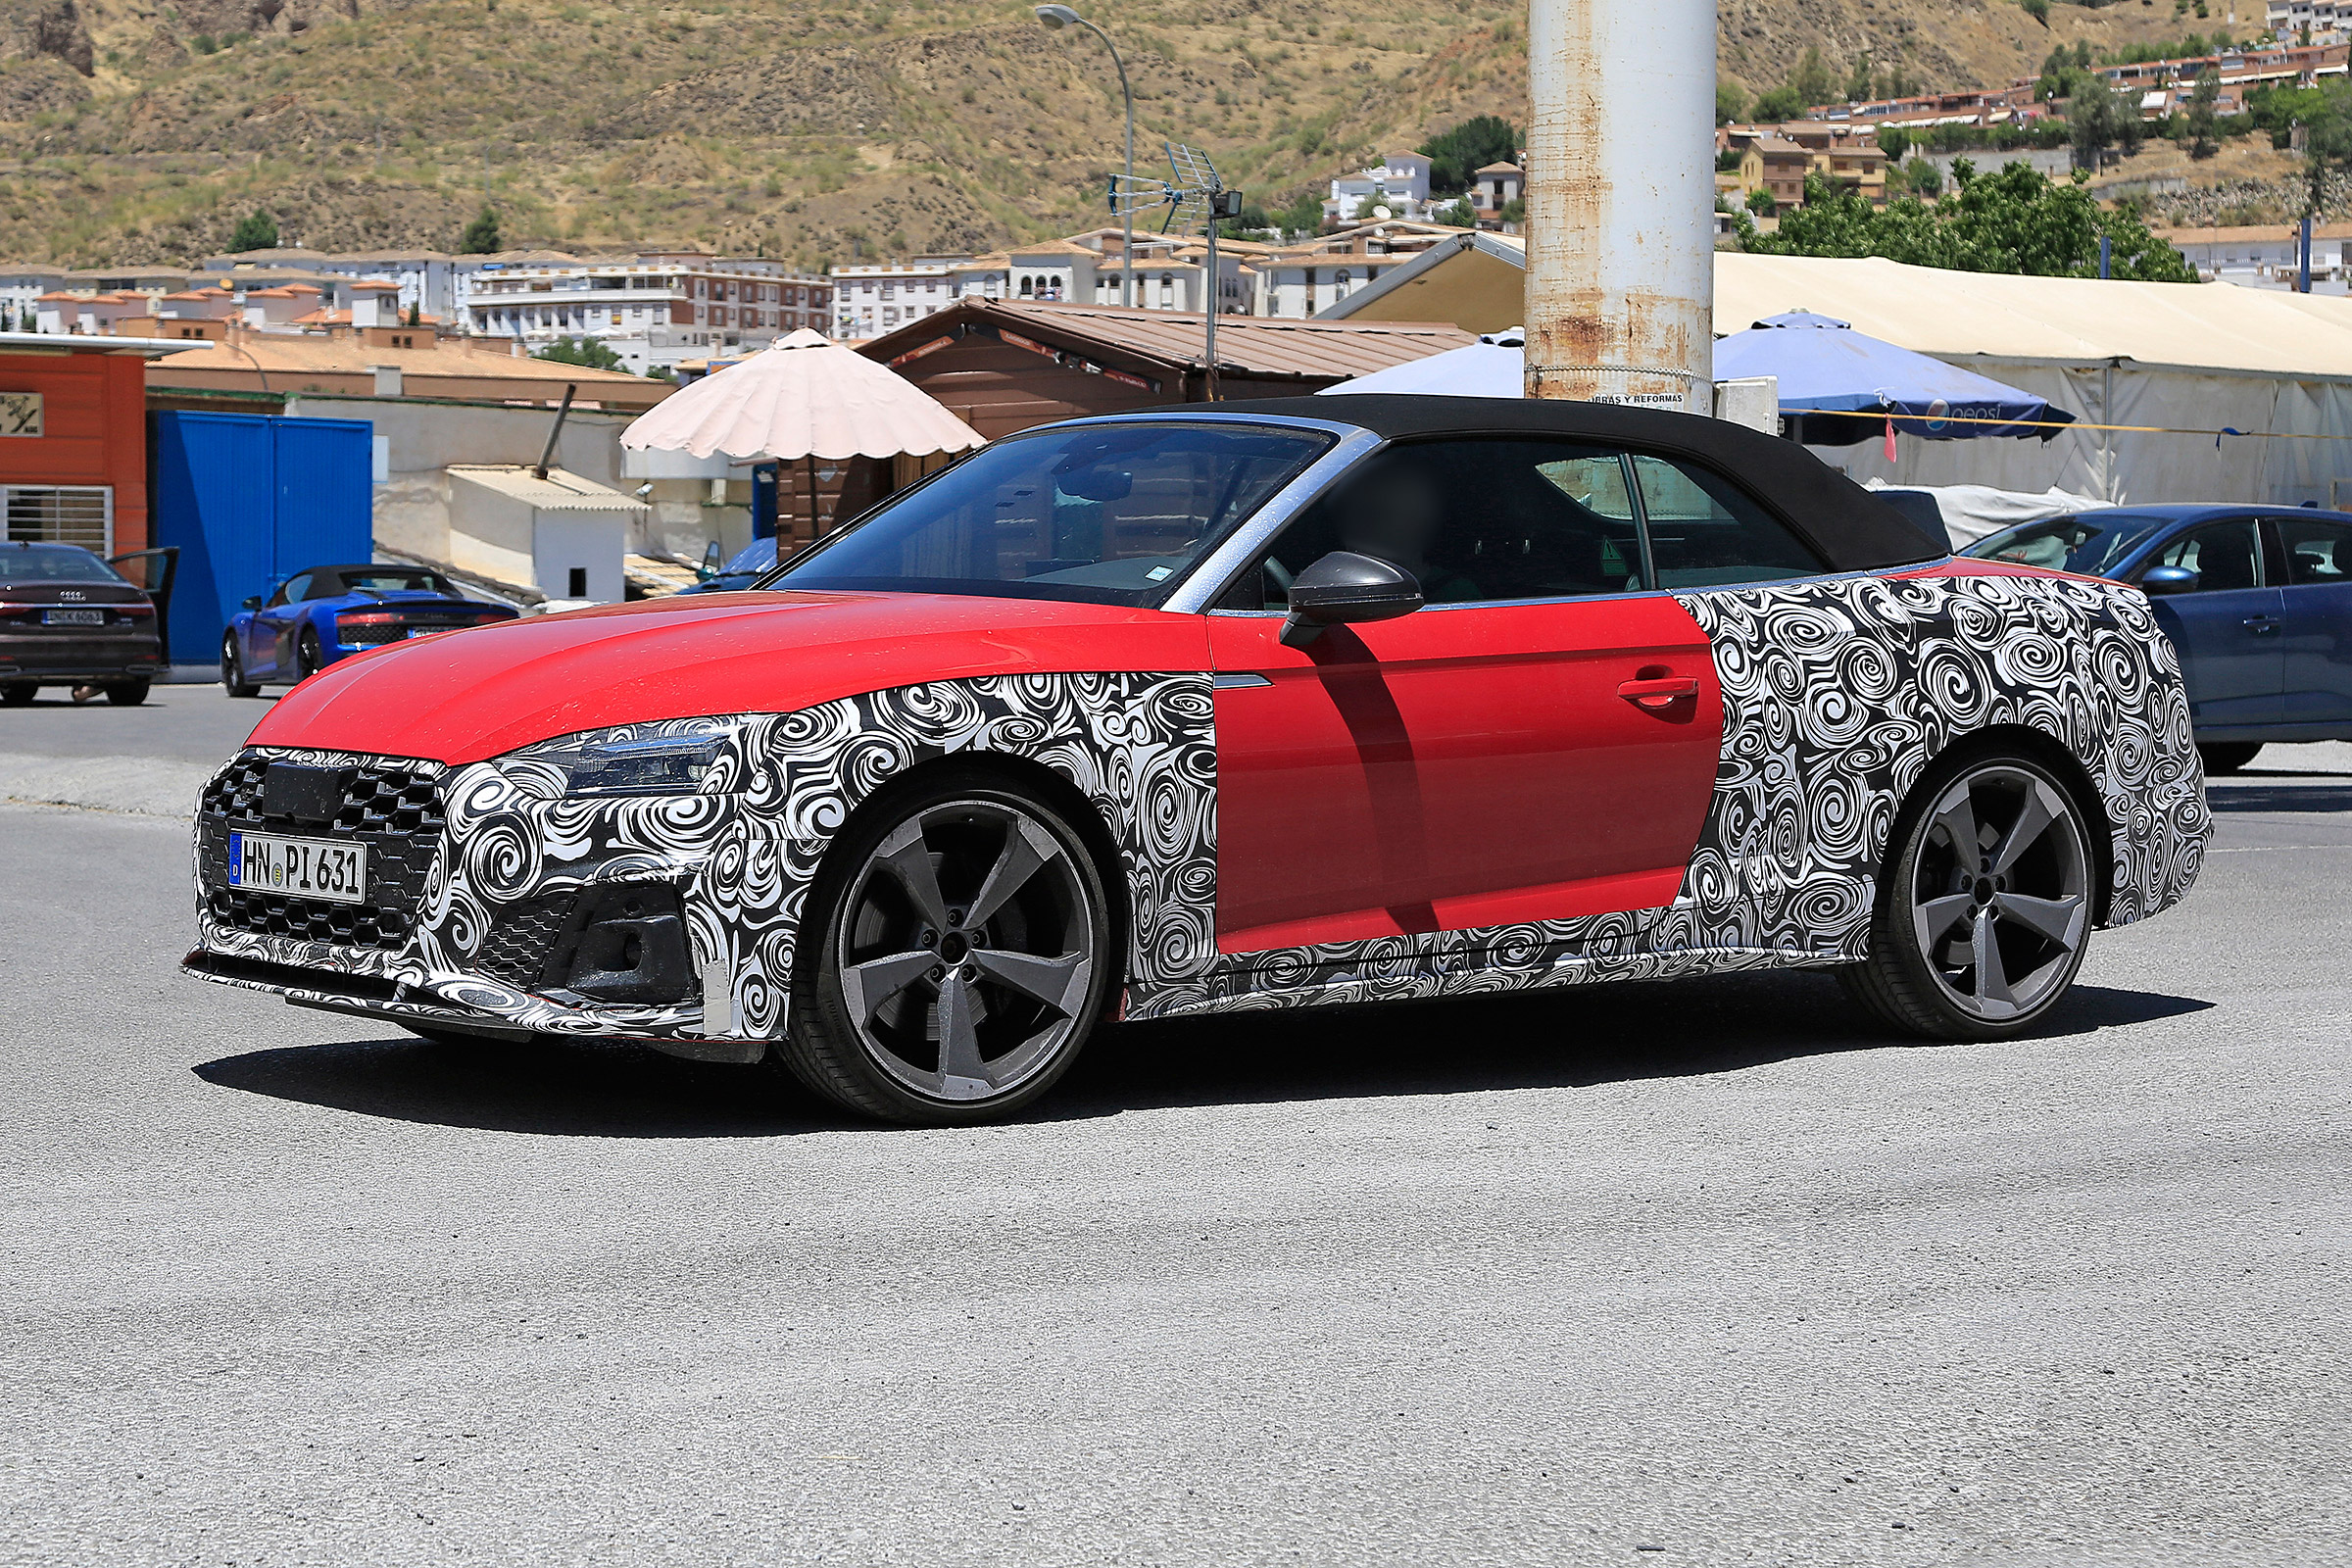 2020 Audi S5 Facelift Spied Before Reveal Alongside Rest Of A5 Range Evo